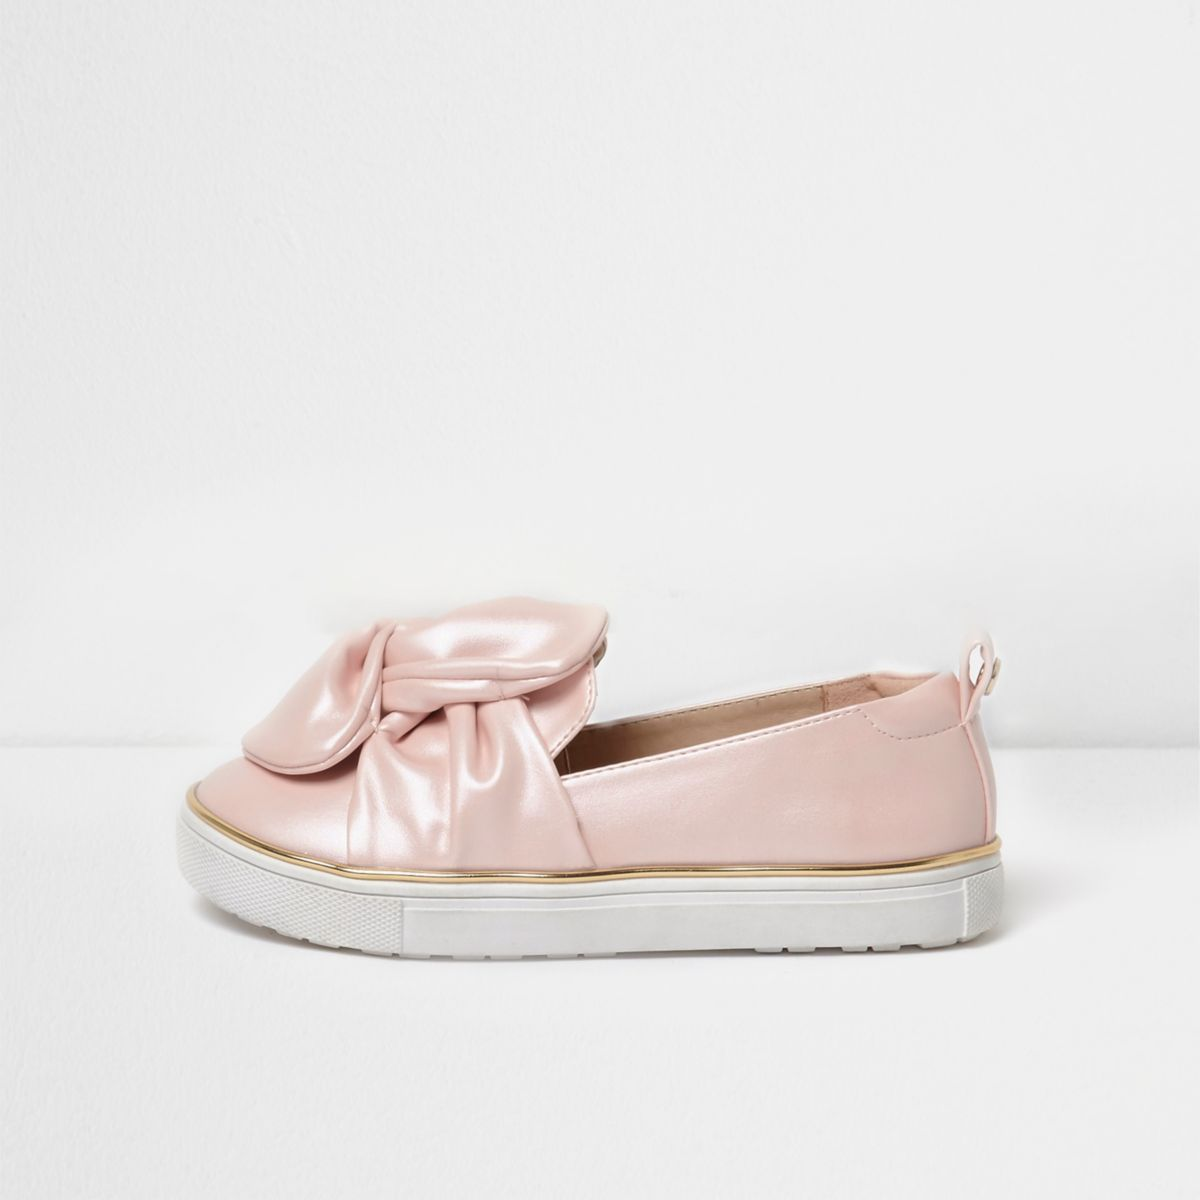 Girls pink bow front slip on plimsolls